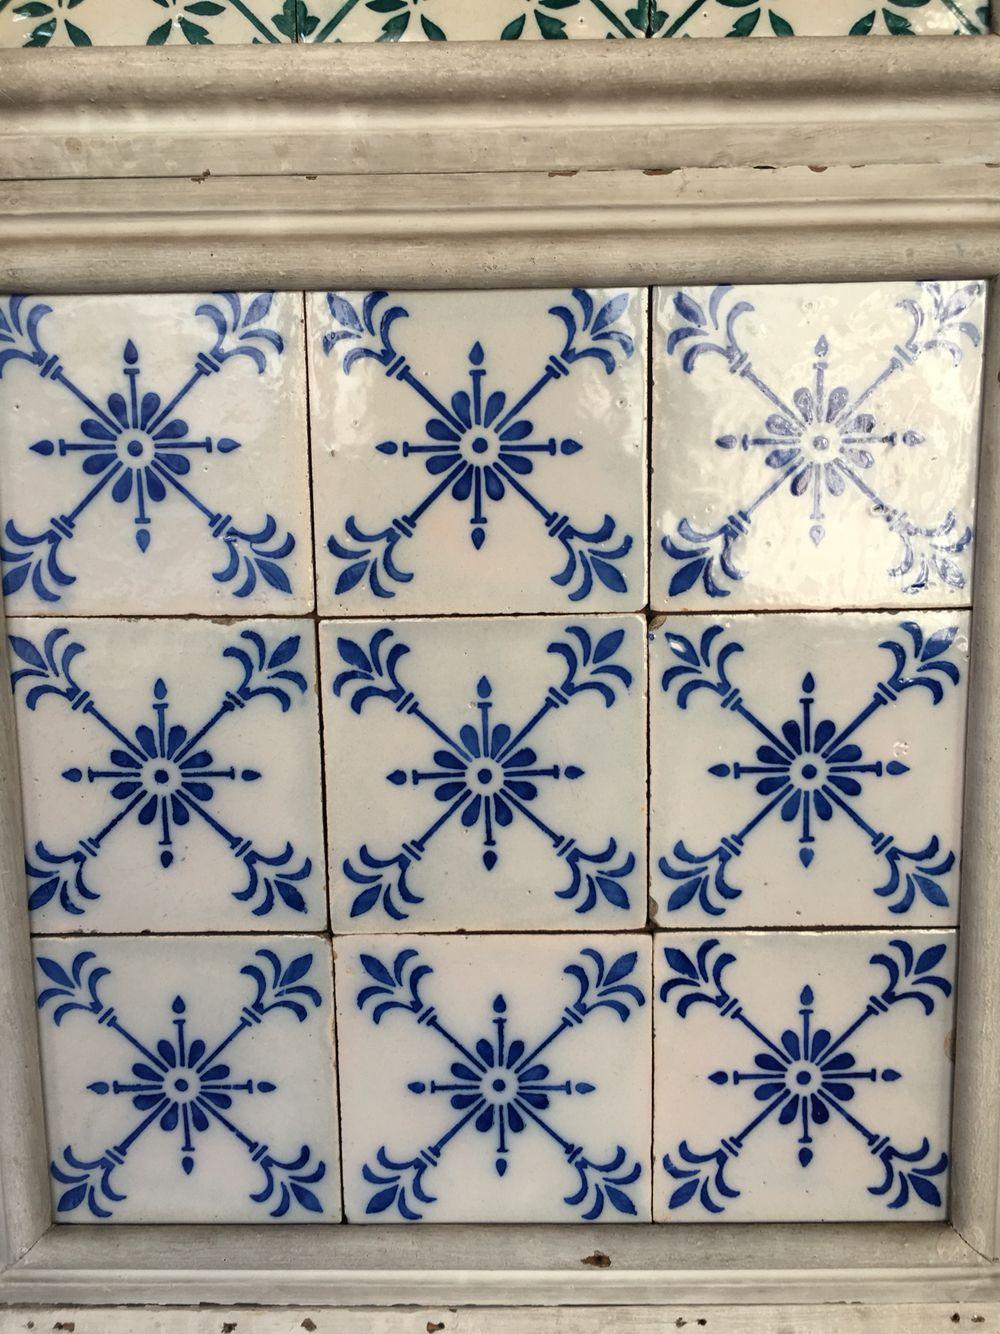 Die Mooiste Teeltjies Wil Dit He Most Beautiful Tiles I Want Some That Fleur De Lis Must Be In My Genes Art Deco Tiles Antique Tiles Tile Murals